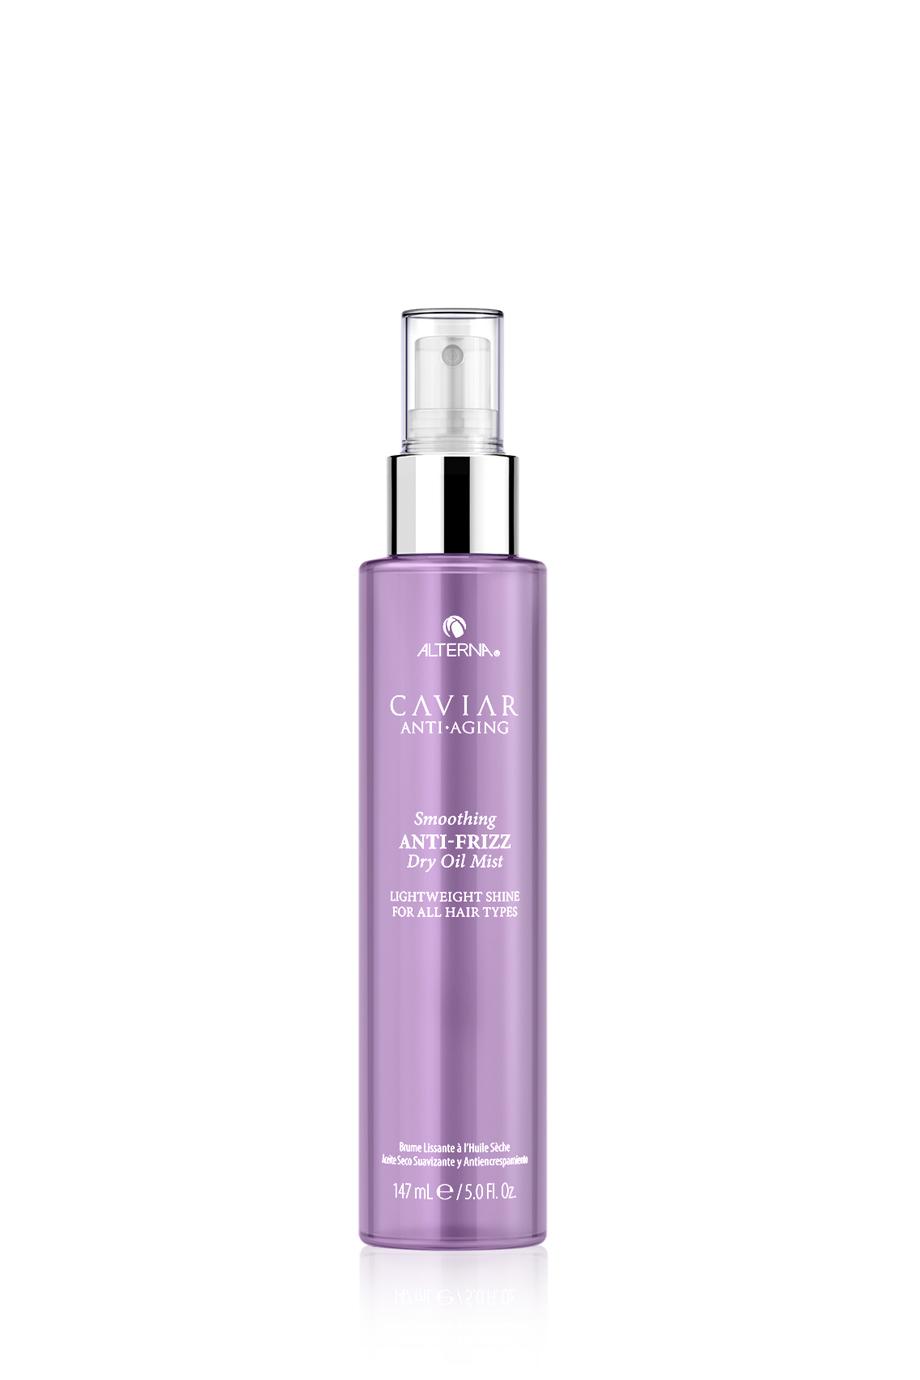 CAVIAR Anti-Aging Smoothing Anti-Frizz Dry Oil Mist Невесомое полирующее масло-спрей для контроля и гладкости волос, 147 мл